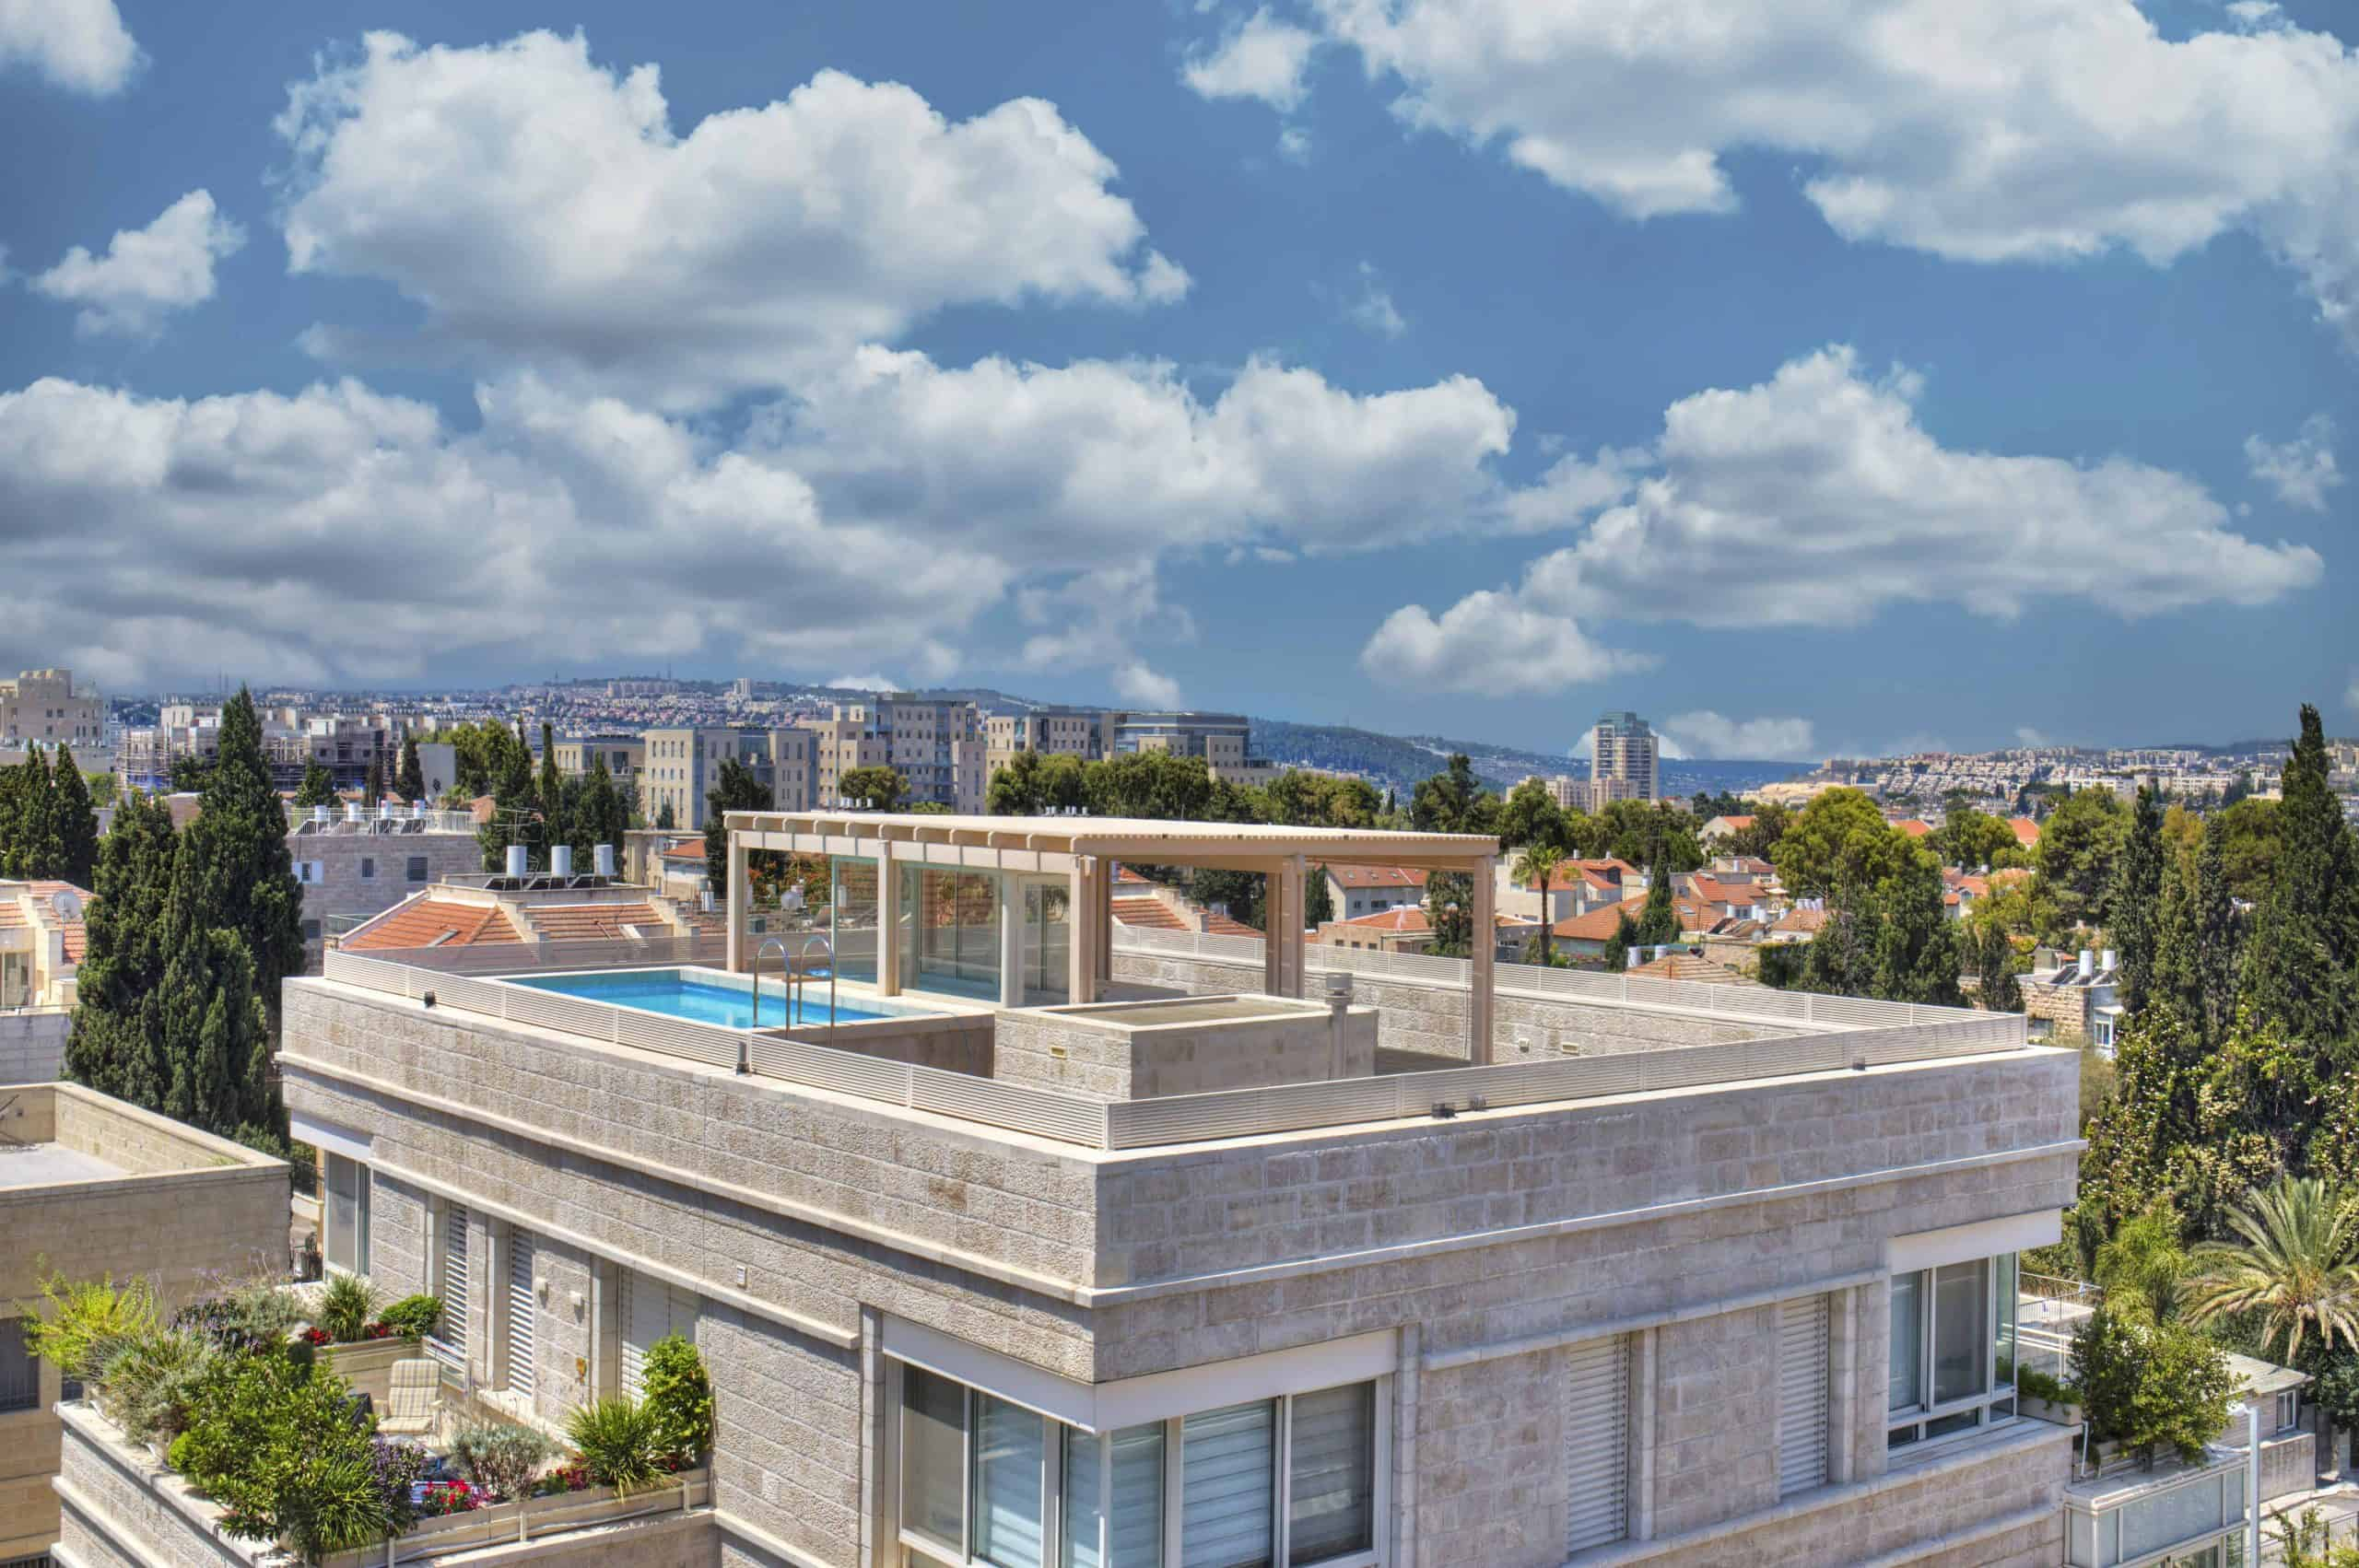 jersualem penthouse with pool